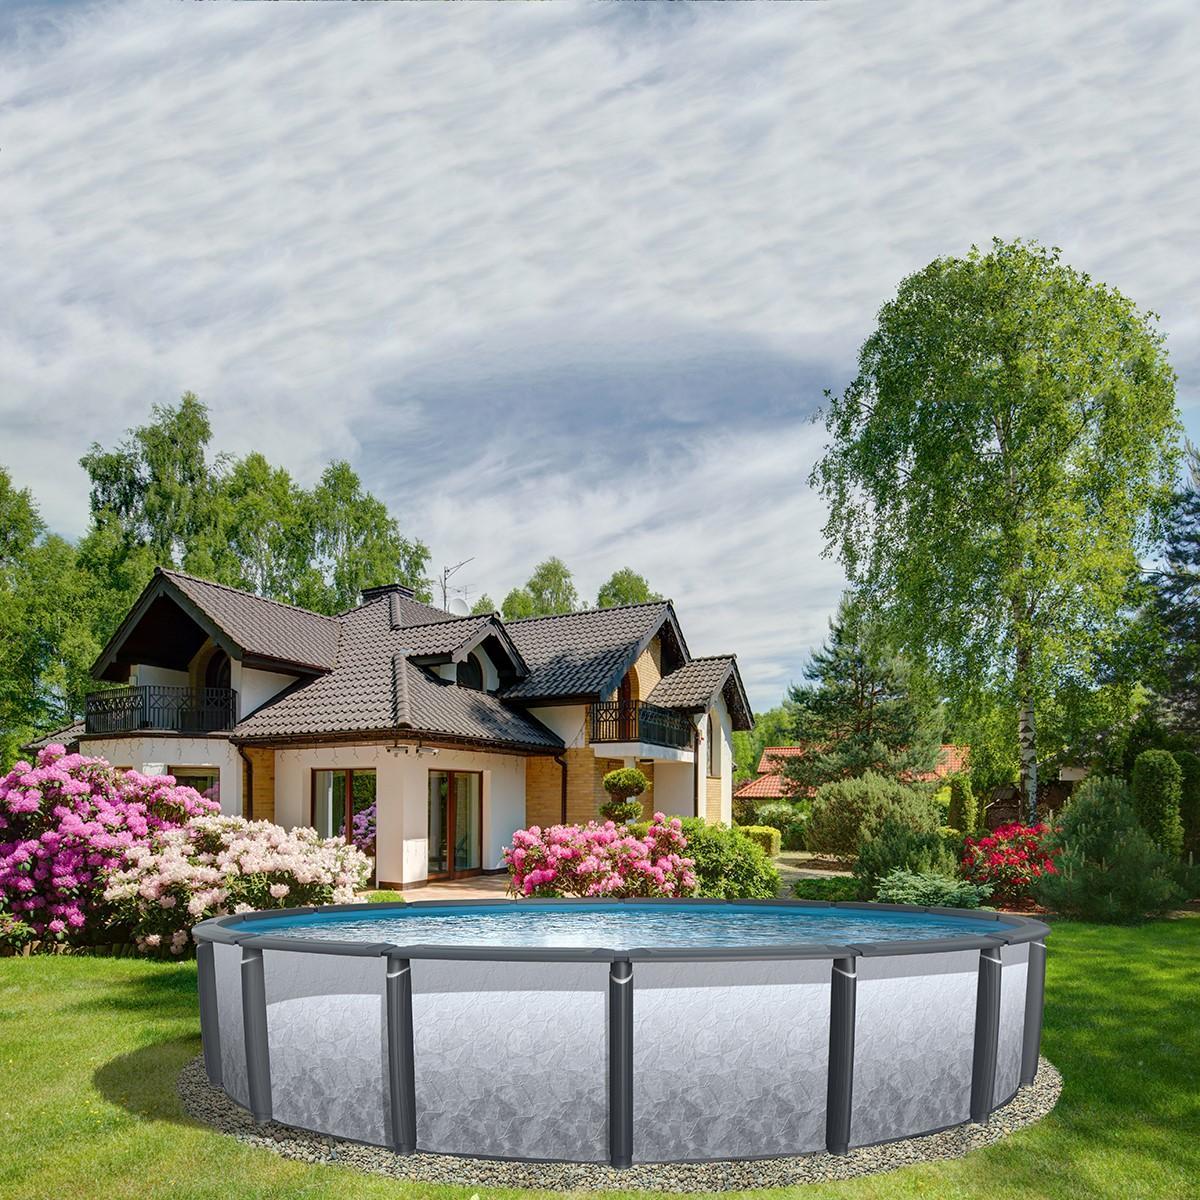 Iconic concept piscine design piscines spas gazebos for Piscine design concept